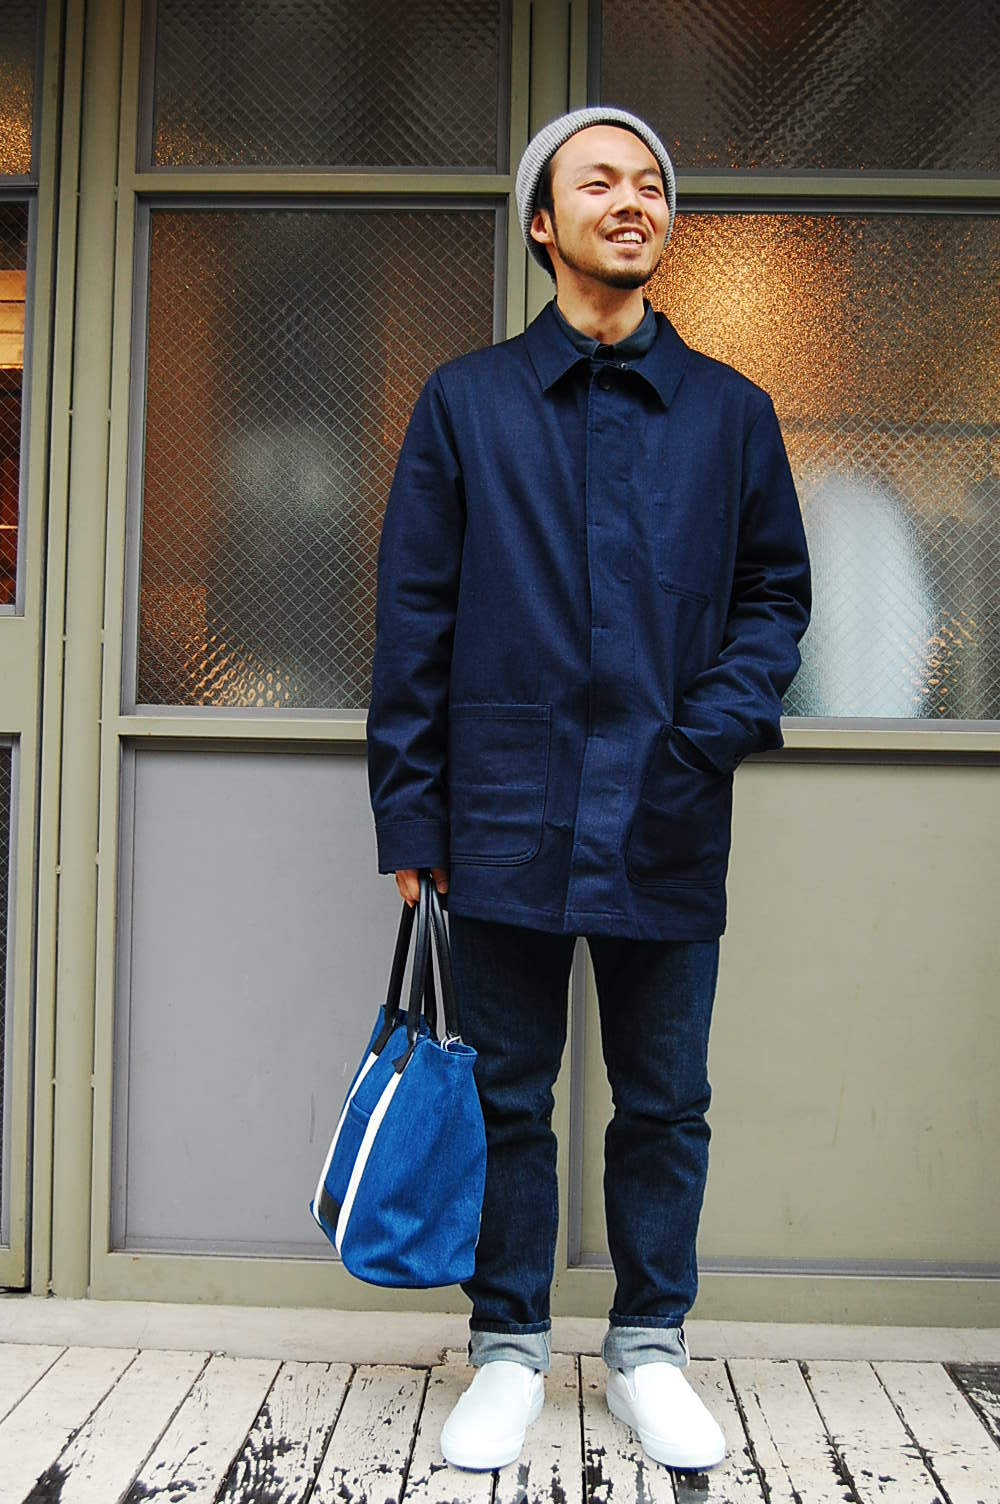 ANJYO|1LDK|SNAP(ショップスタッフスナップ)|HOUYHNHNM(フイナム)